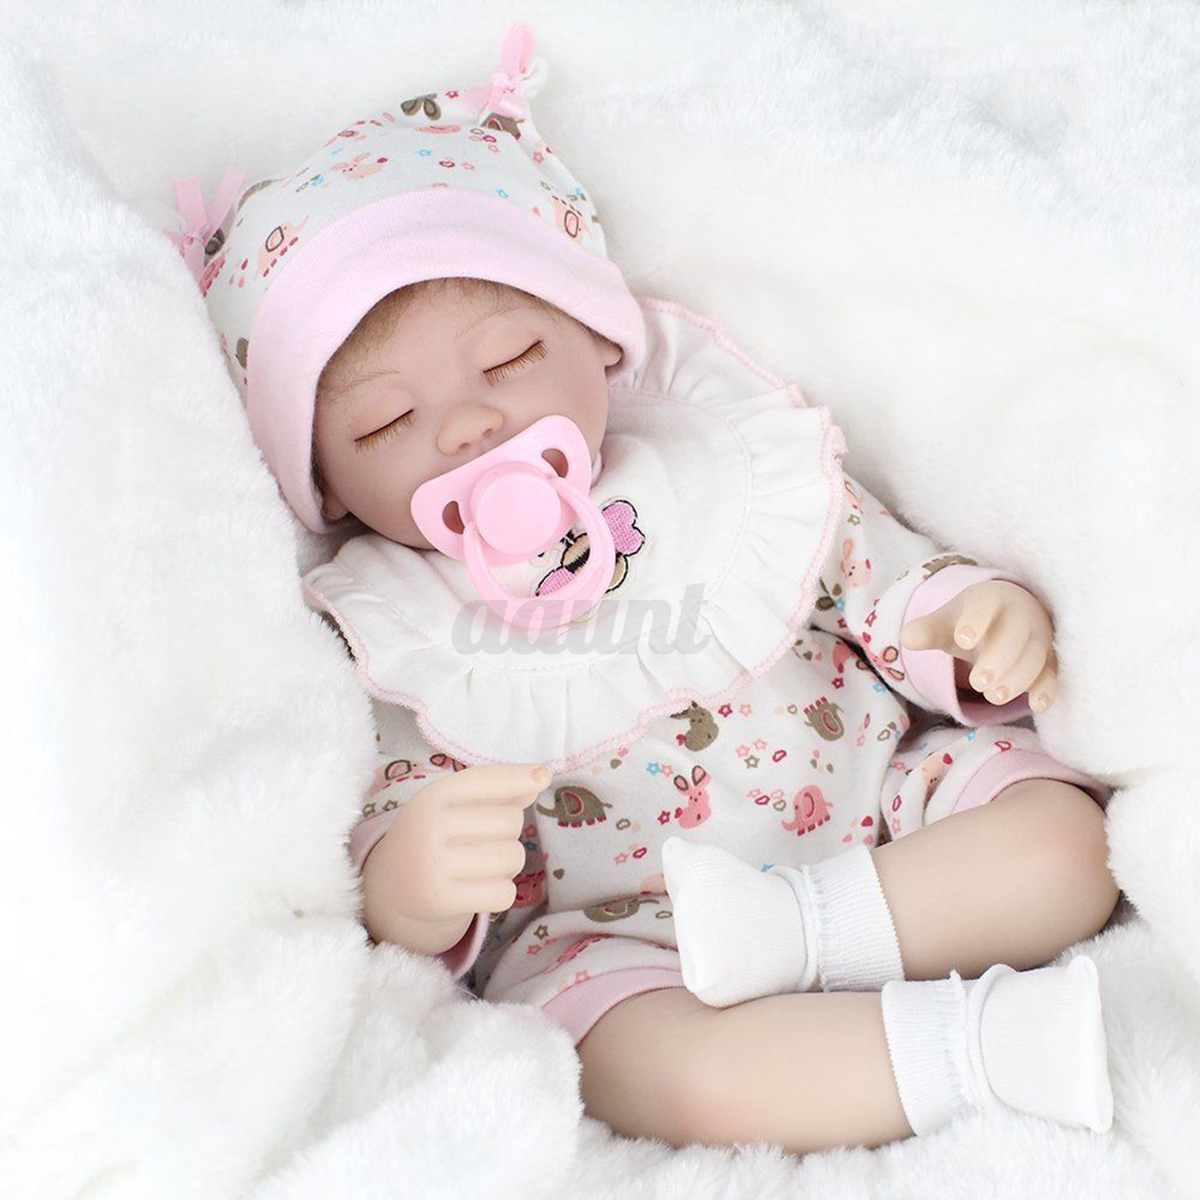 Silicone Reborn Girl Body Dolls Newborn Baby Vinyl